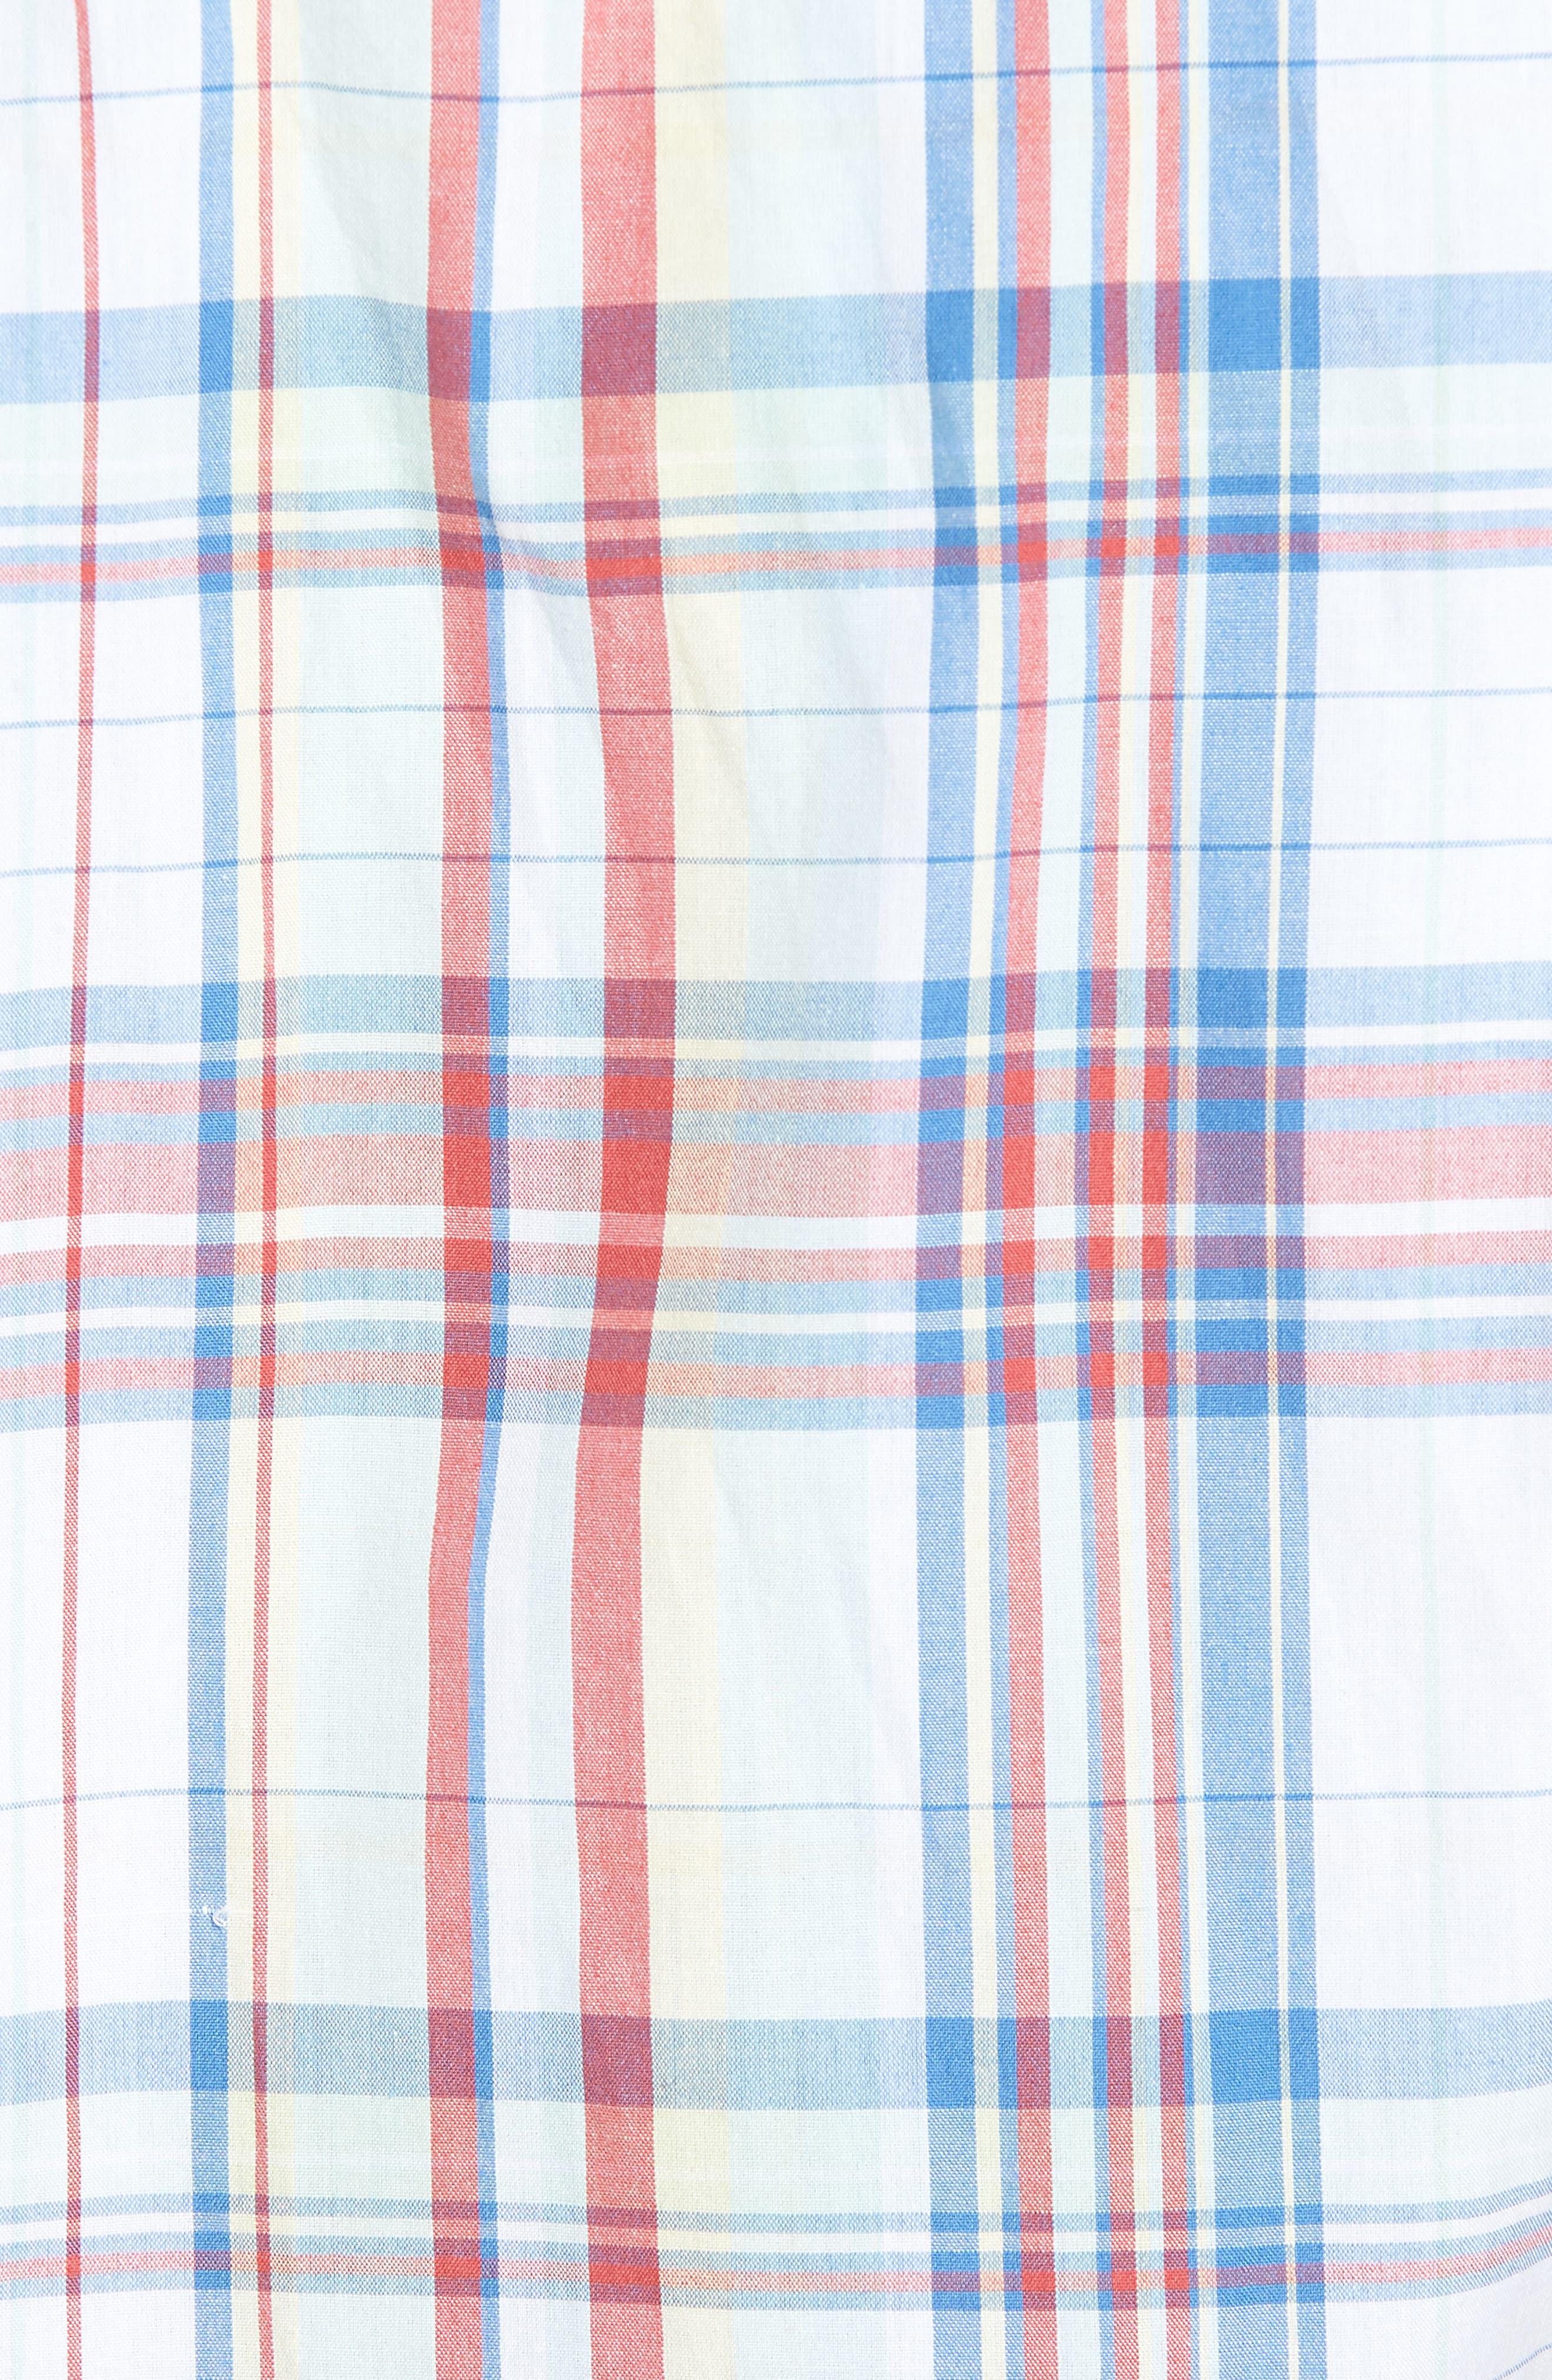 Trim Fit Plaid Short Sleeve Sport Shirt,                             Alternate thumbnail 5, color,                             White Red Multi Plaid